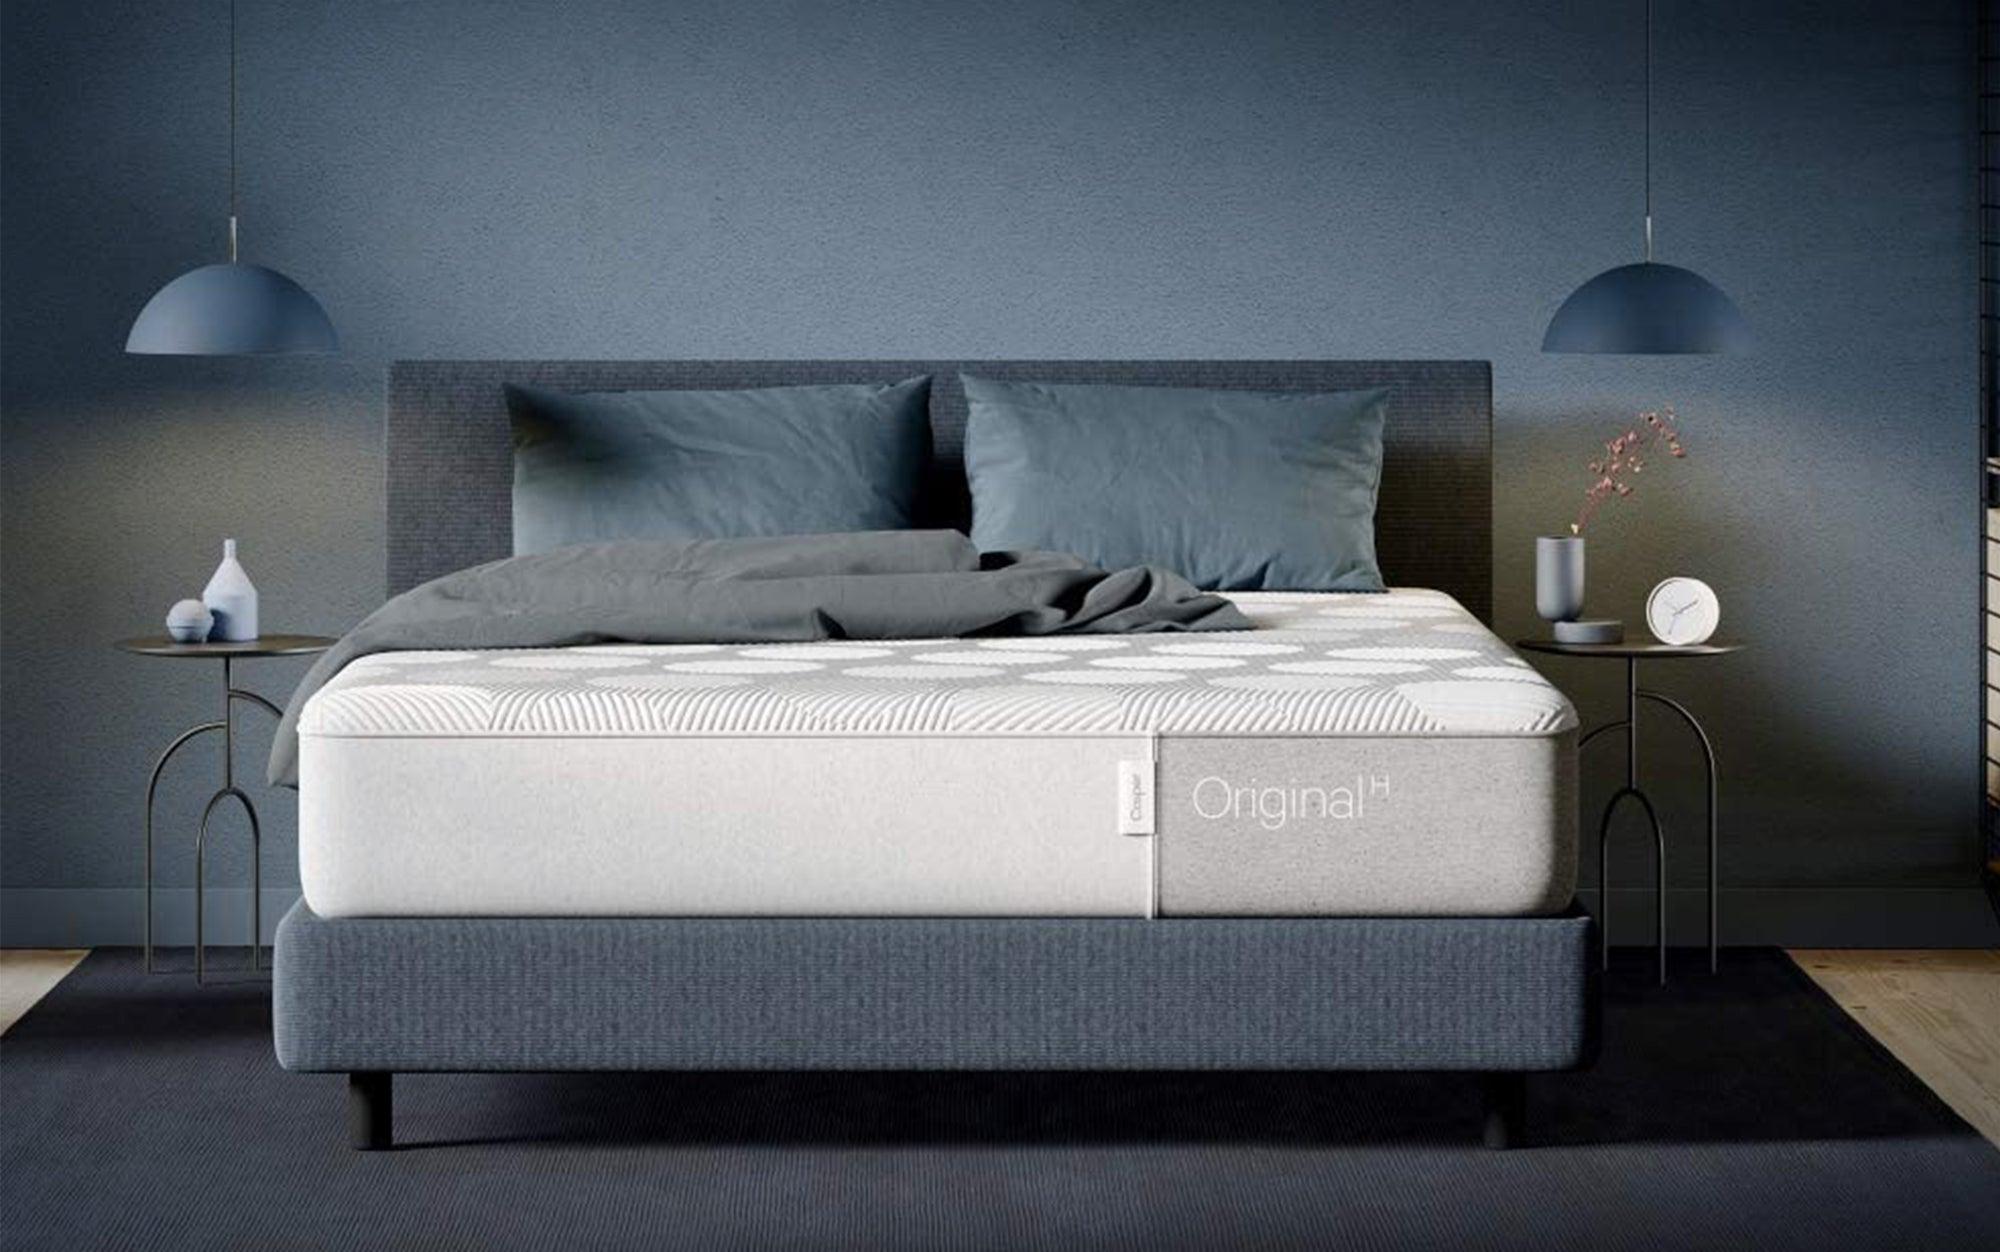 Casper Original Hybrid Mattress is the best hybrid mattress on the market.